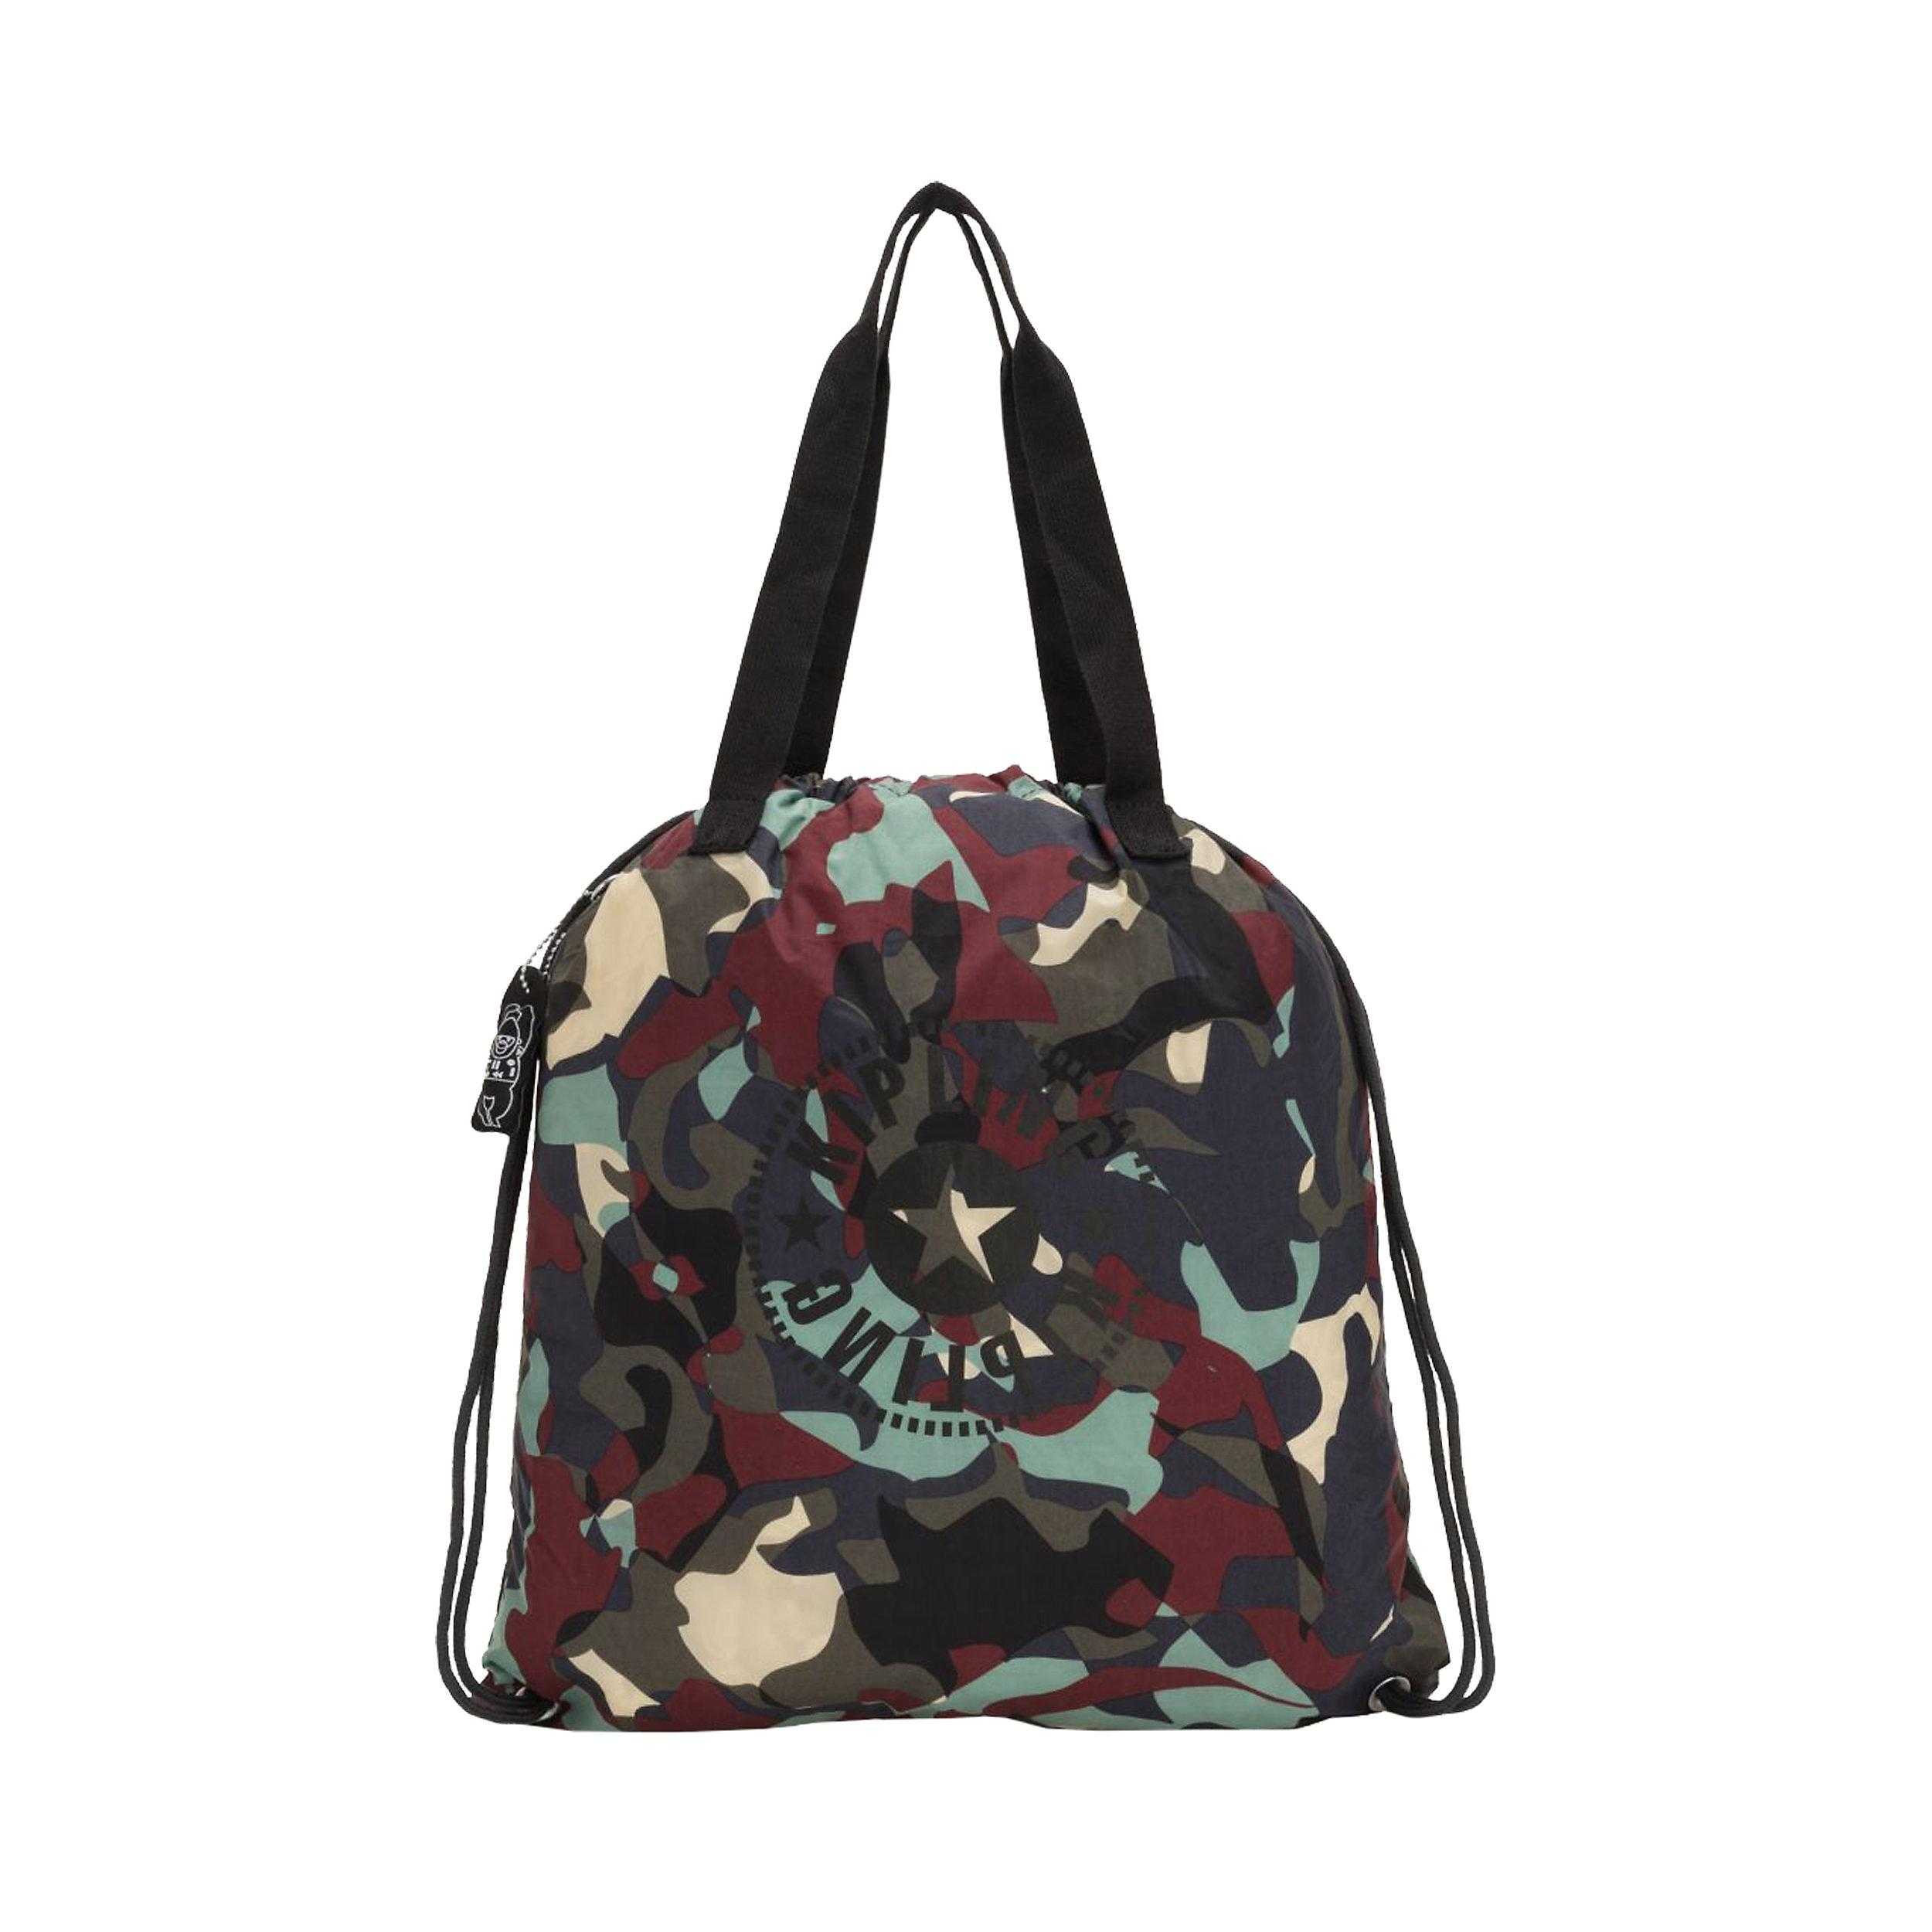 Foldable Bag Hiphurray New Classics M 14 Liter